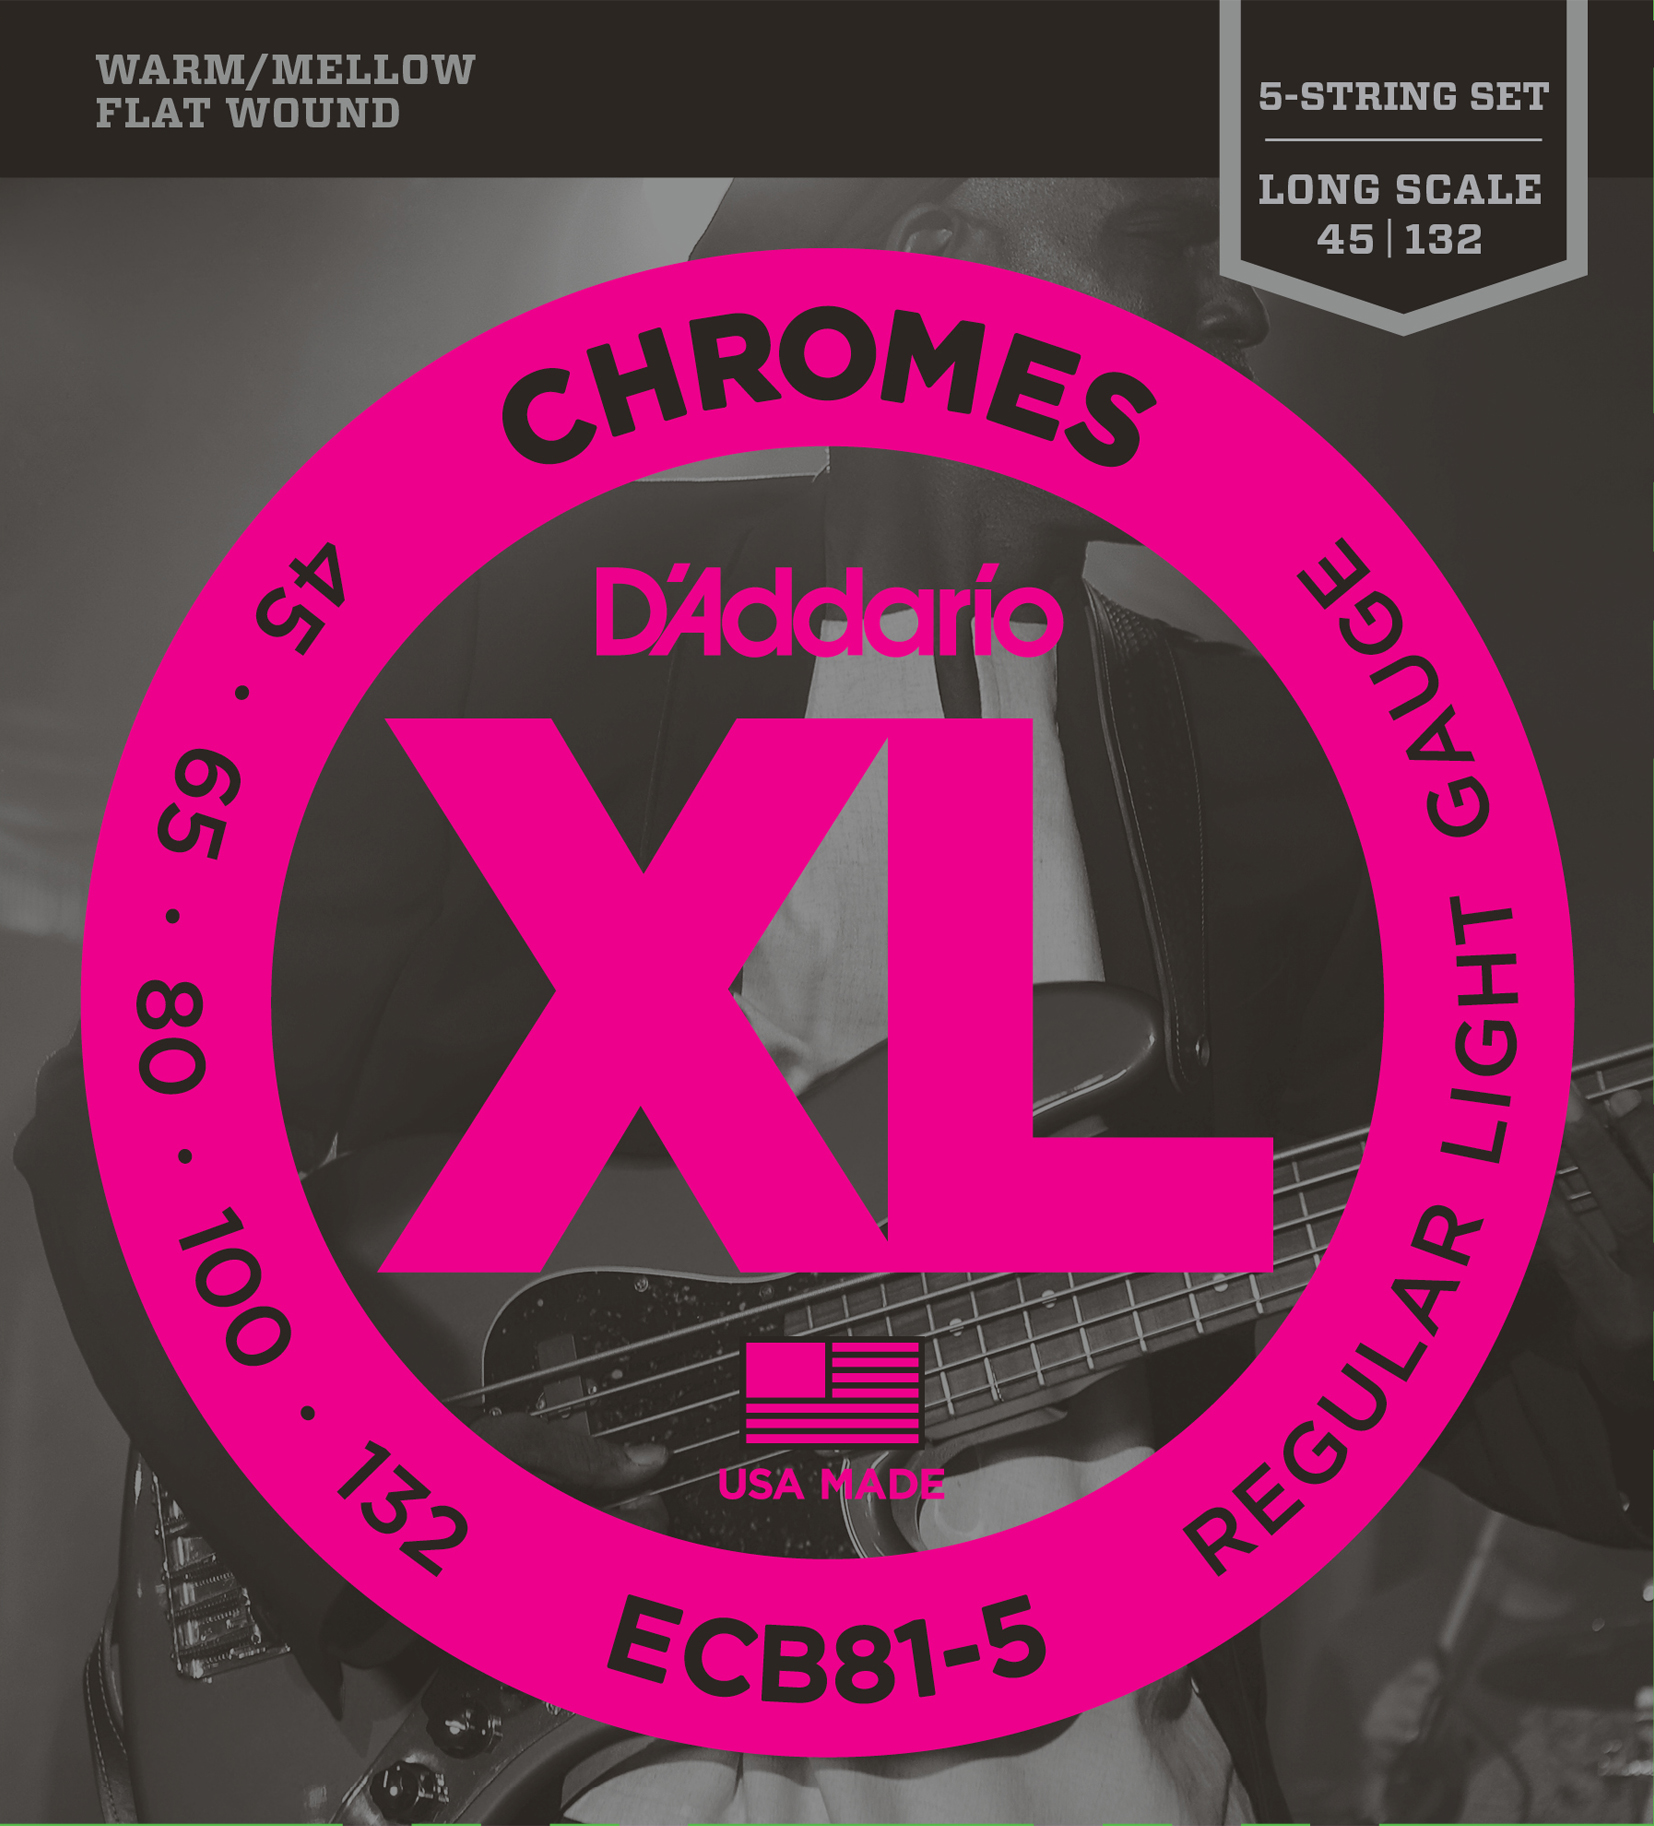 D'Addario Chromes ECB81-5 5 String Electric Bass Stringset